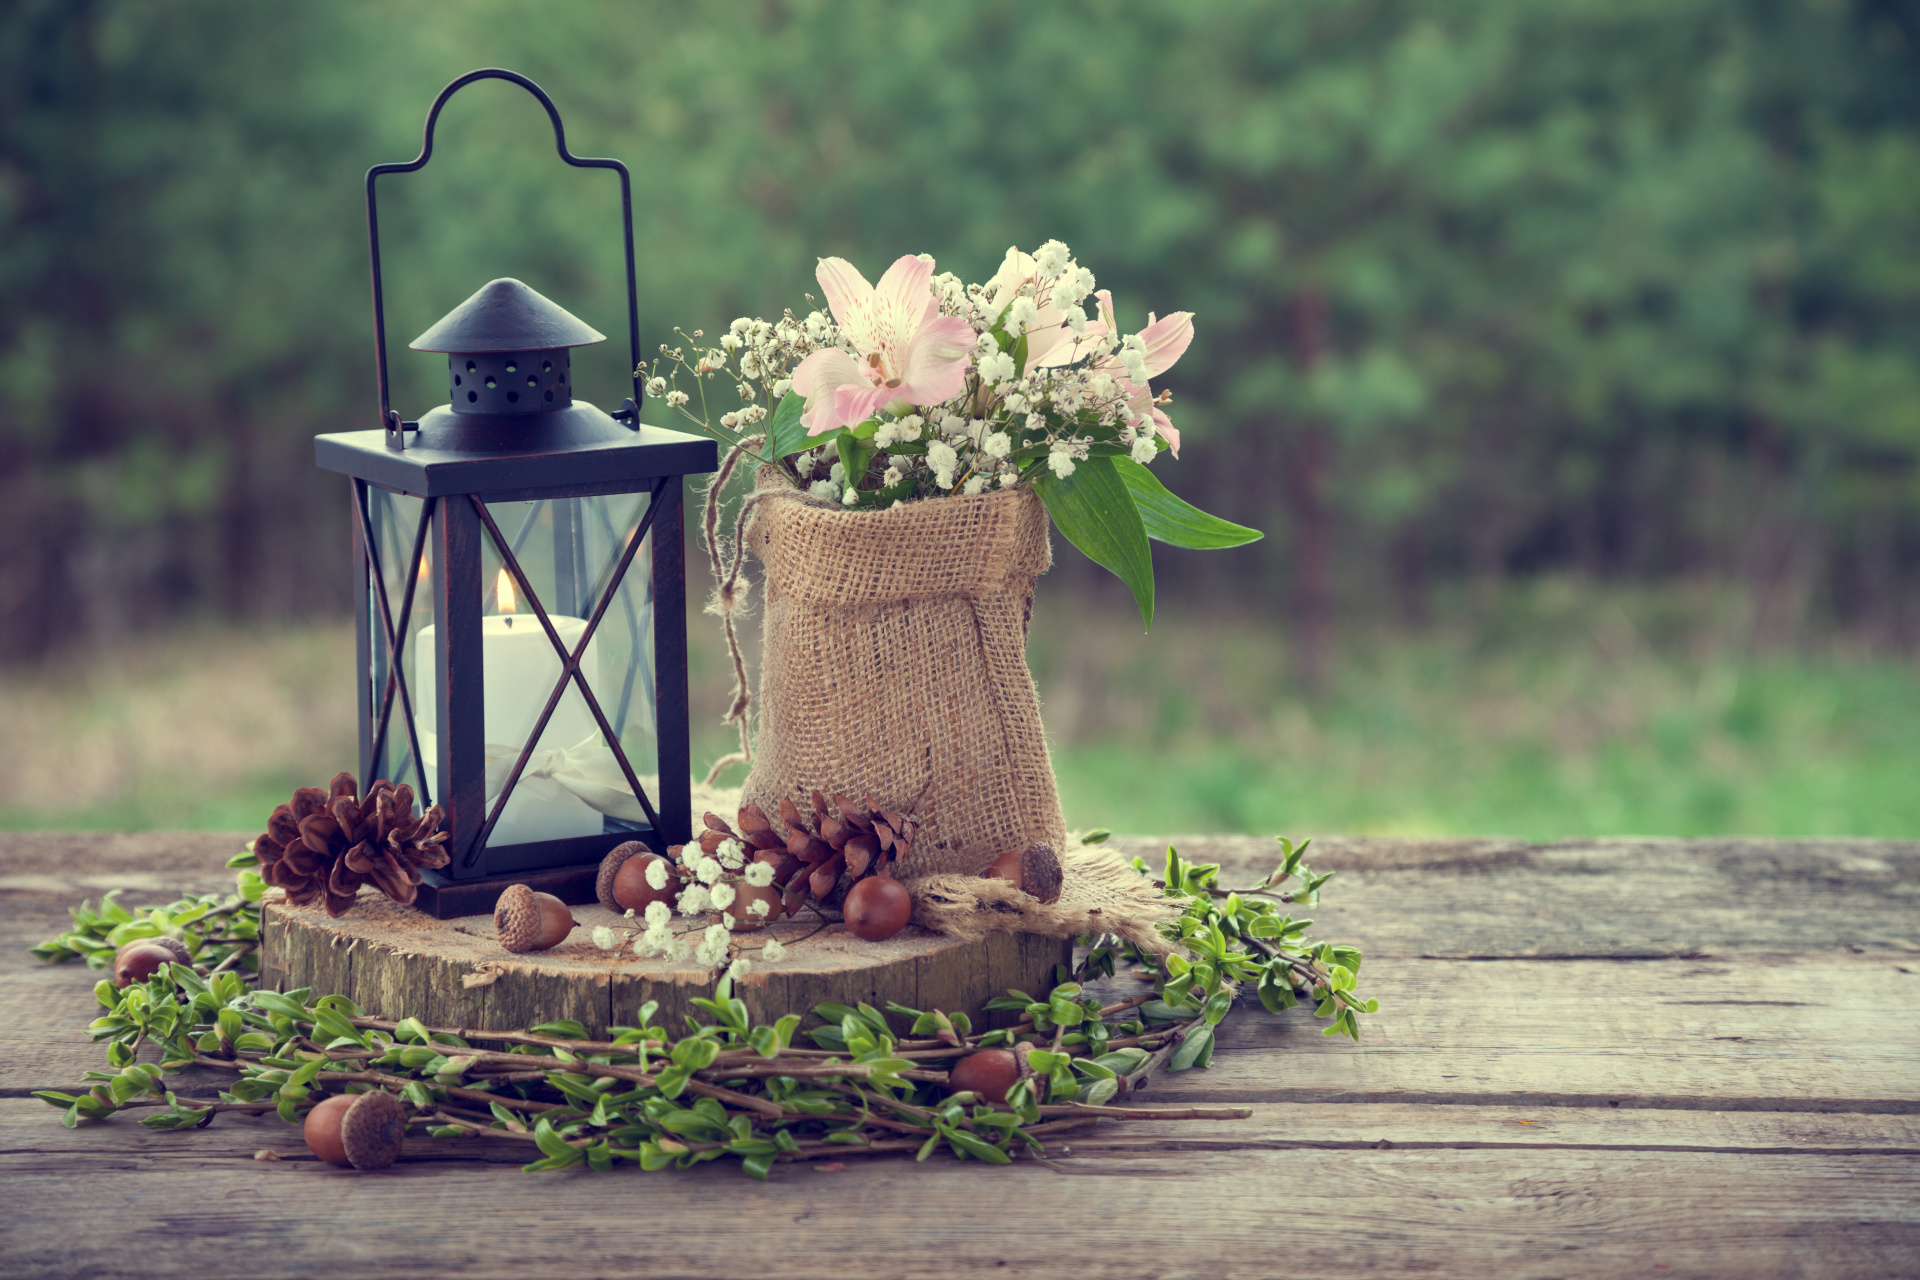 rustic wedding centerpiece, rustic wedding decoration, latern and wood centerpiece